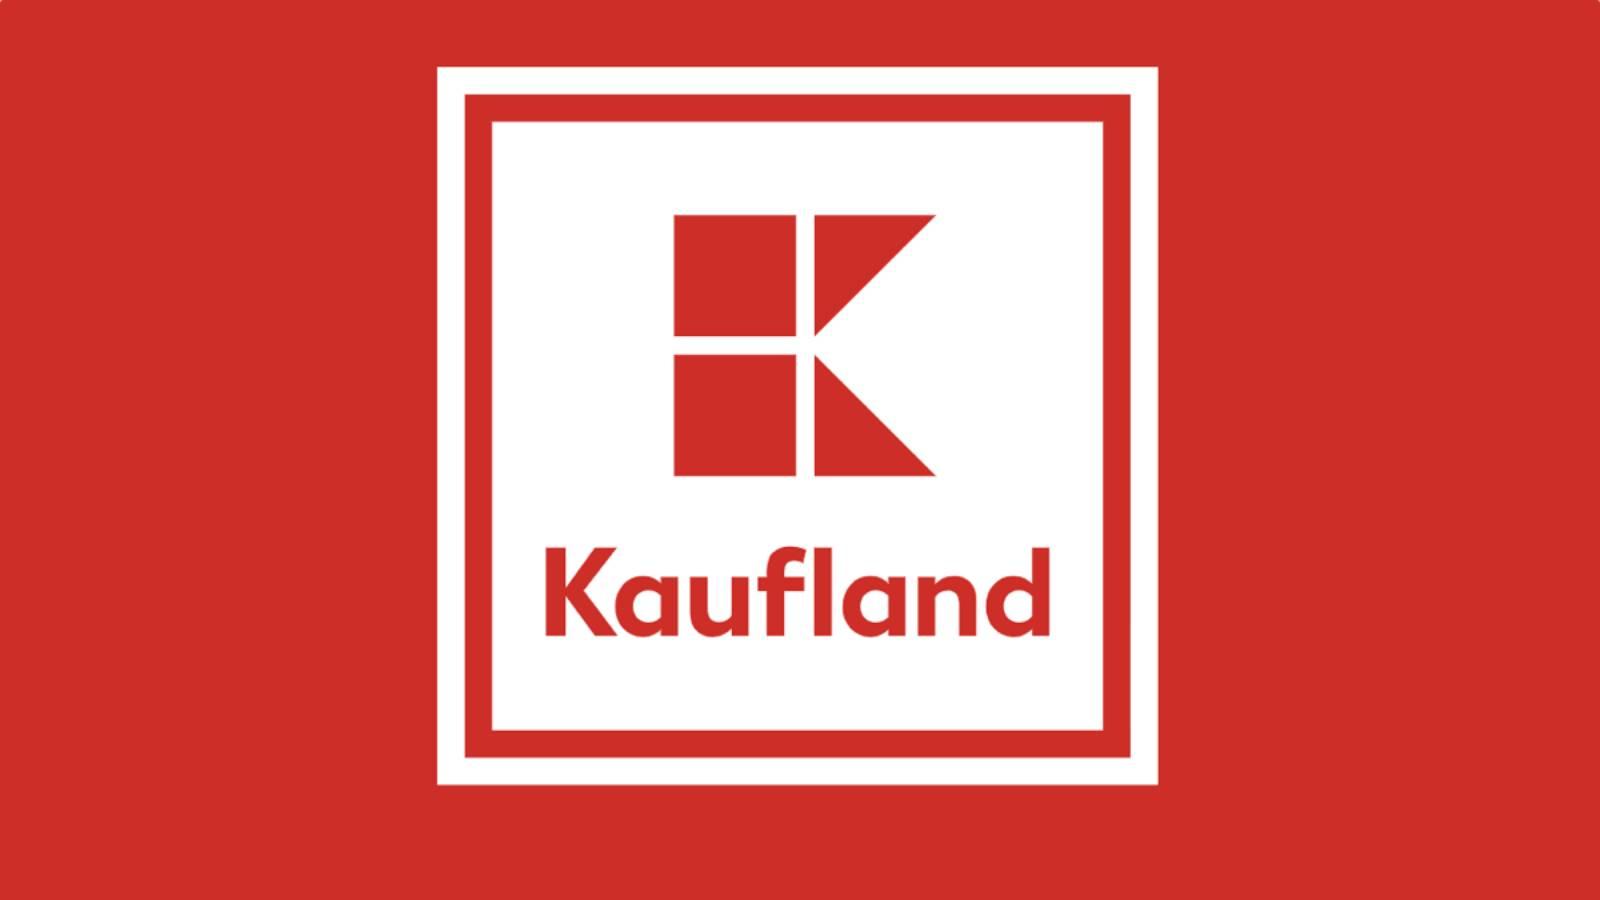 Kaufland traditional